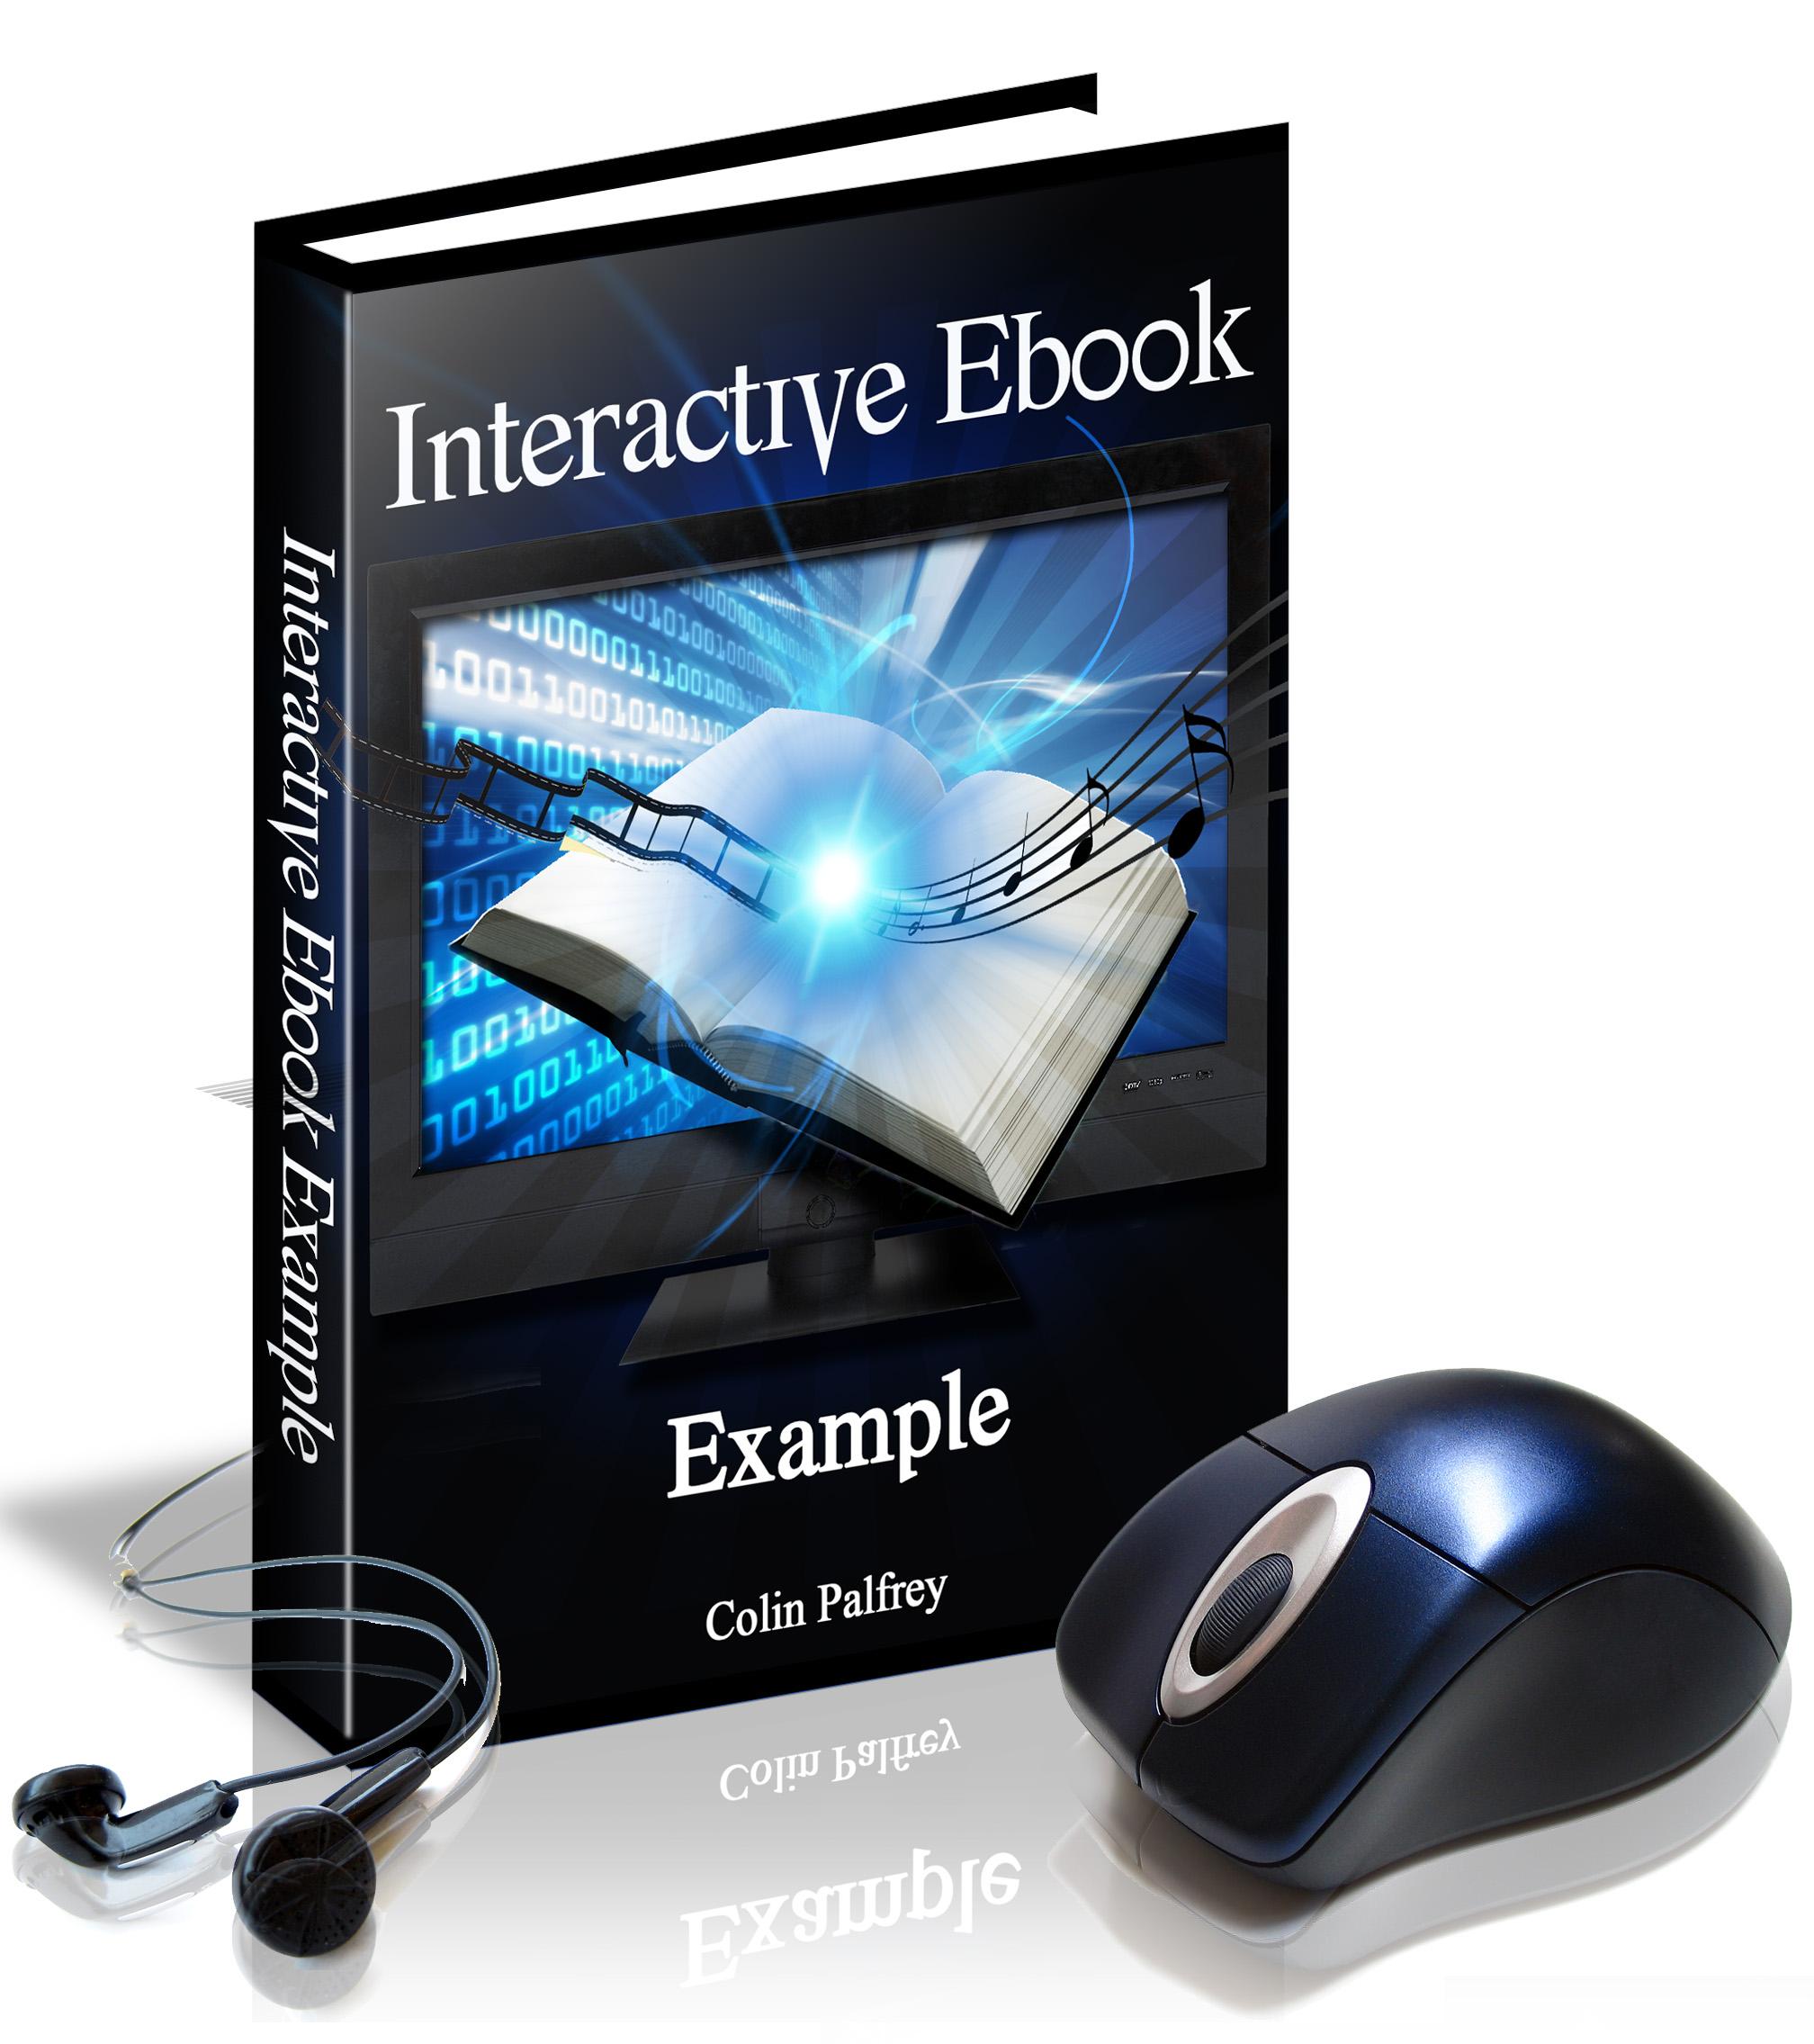 InterActiveEbookExample